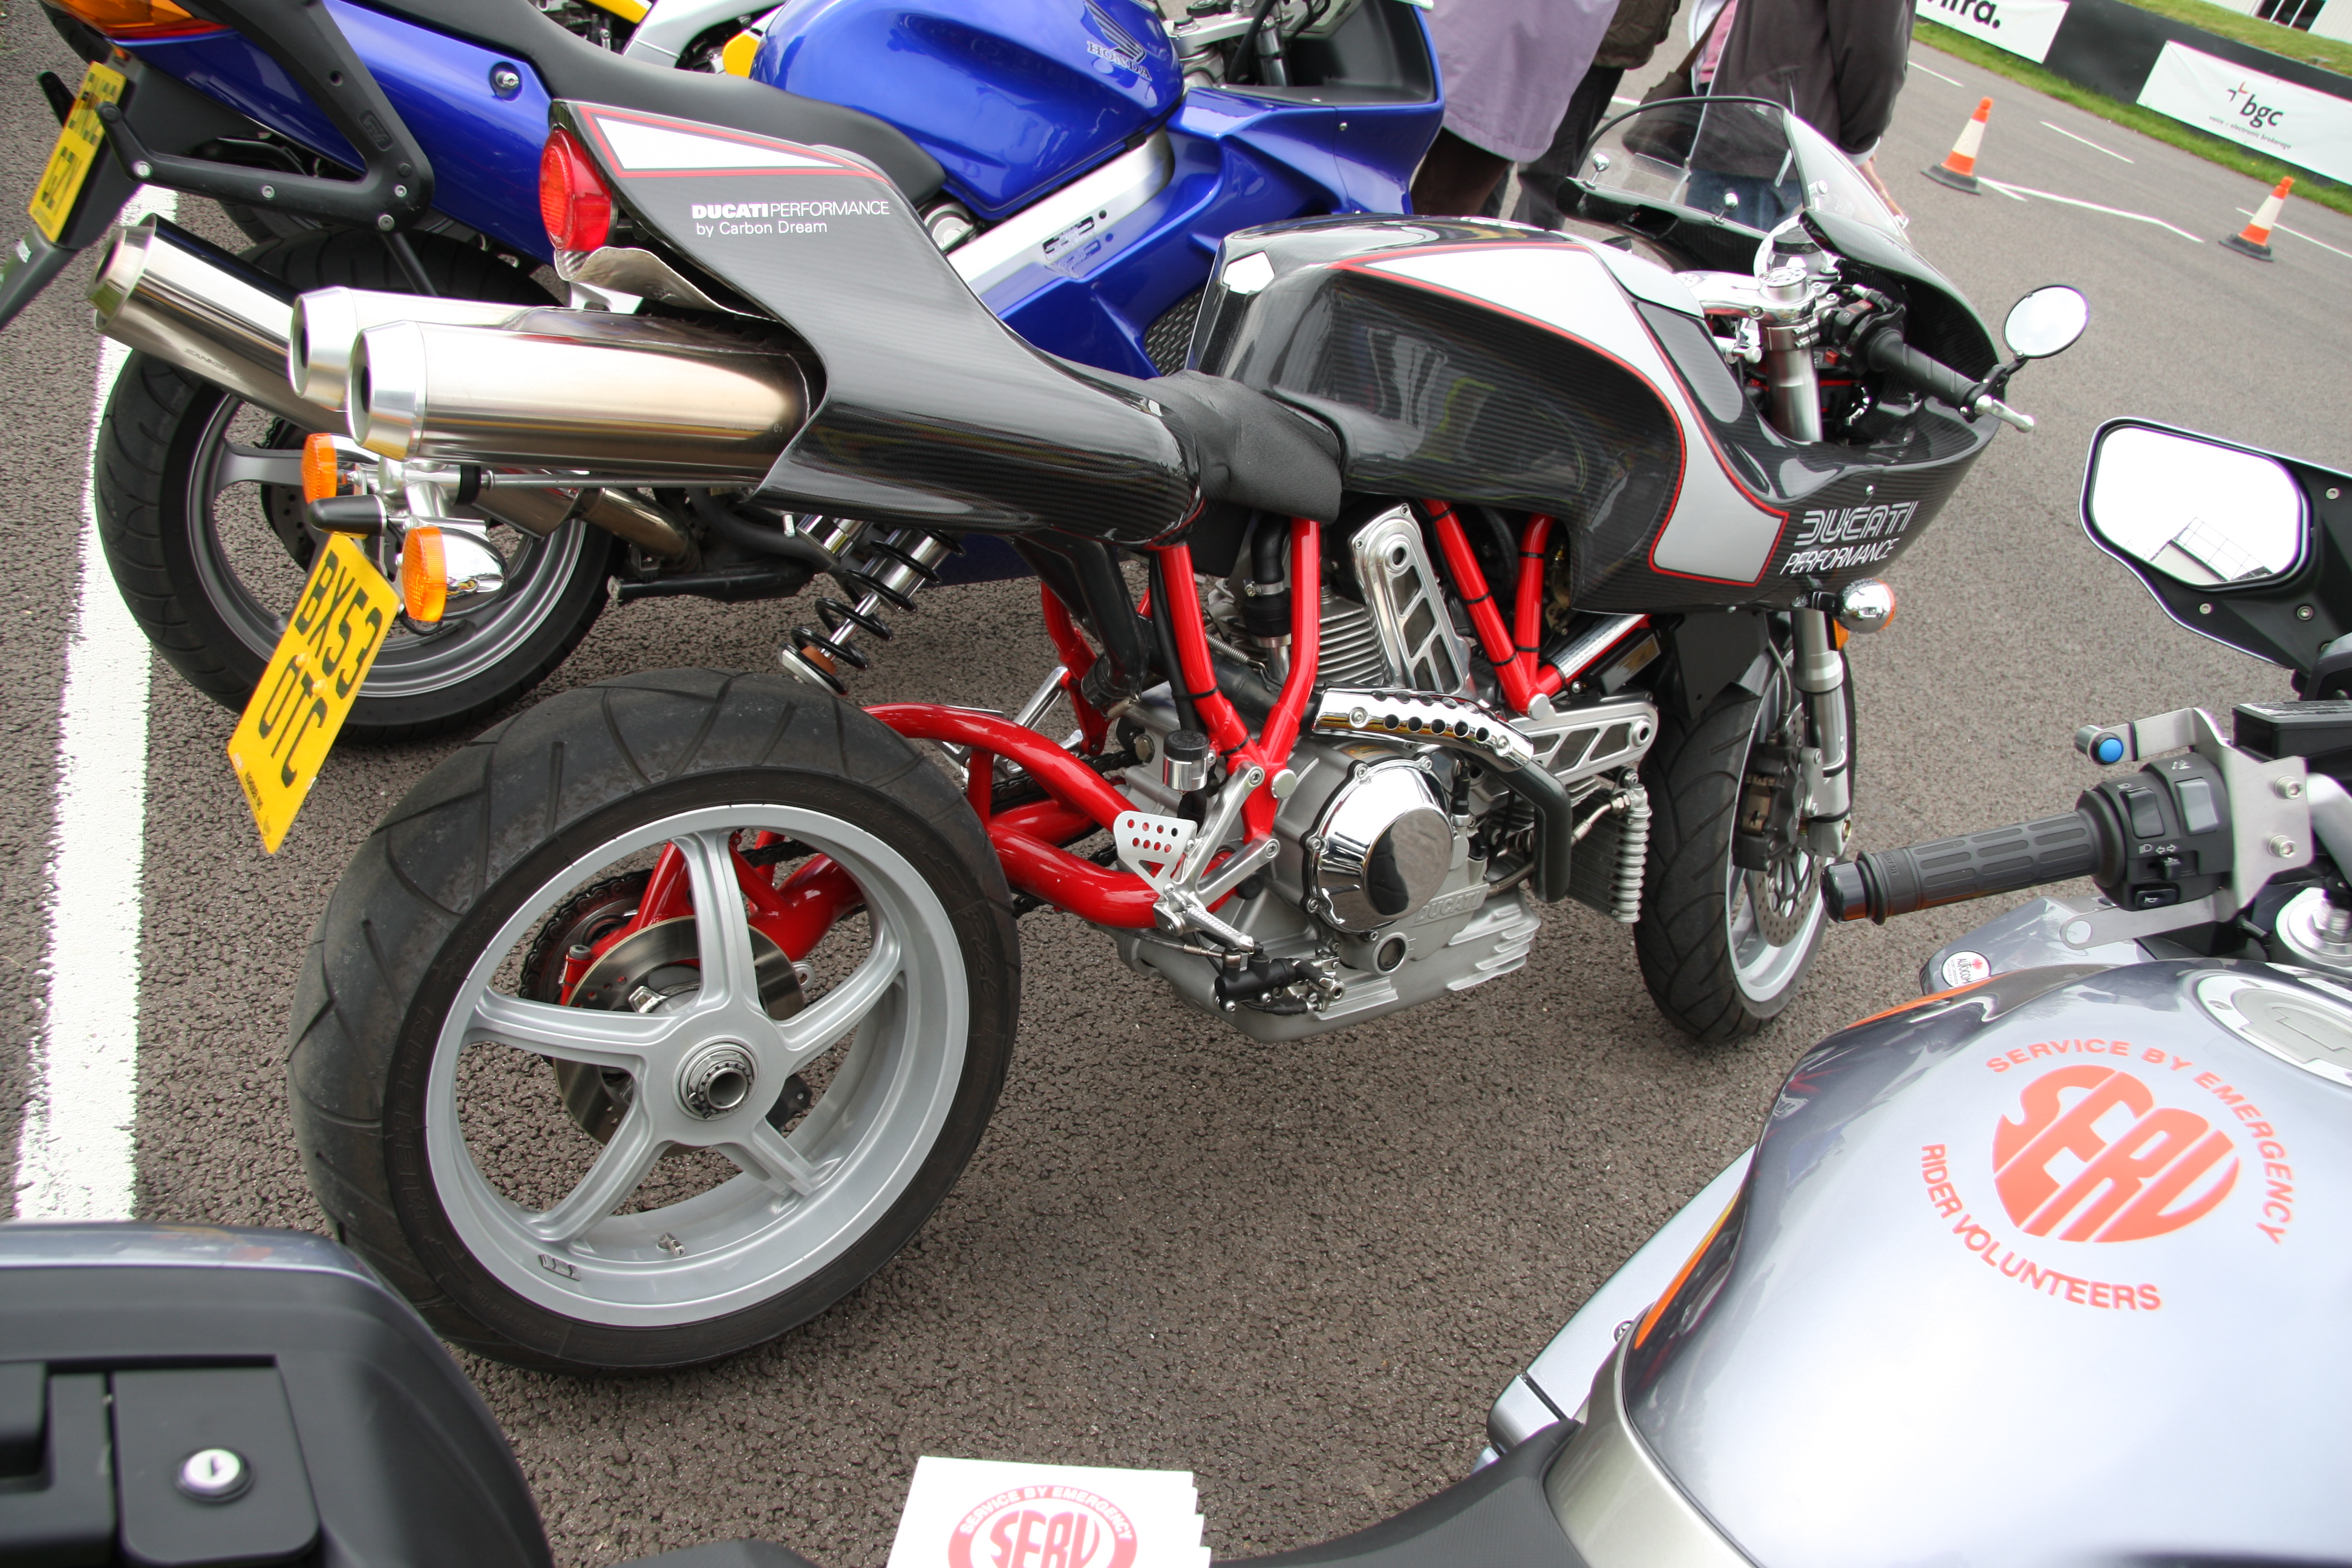 Ducati Multistrada Parts List